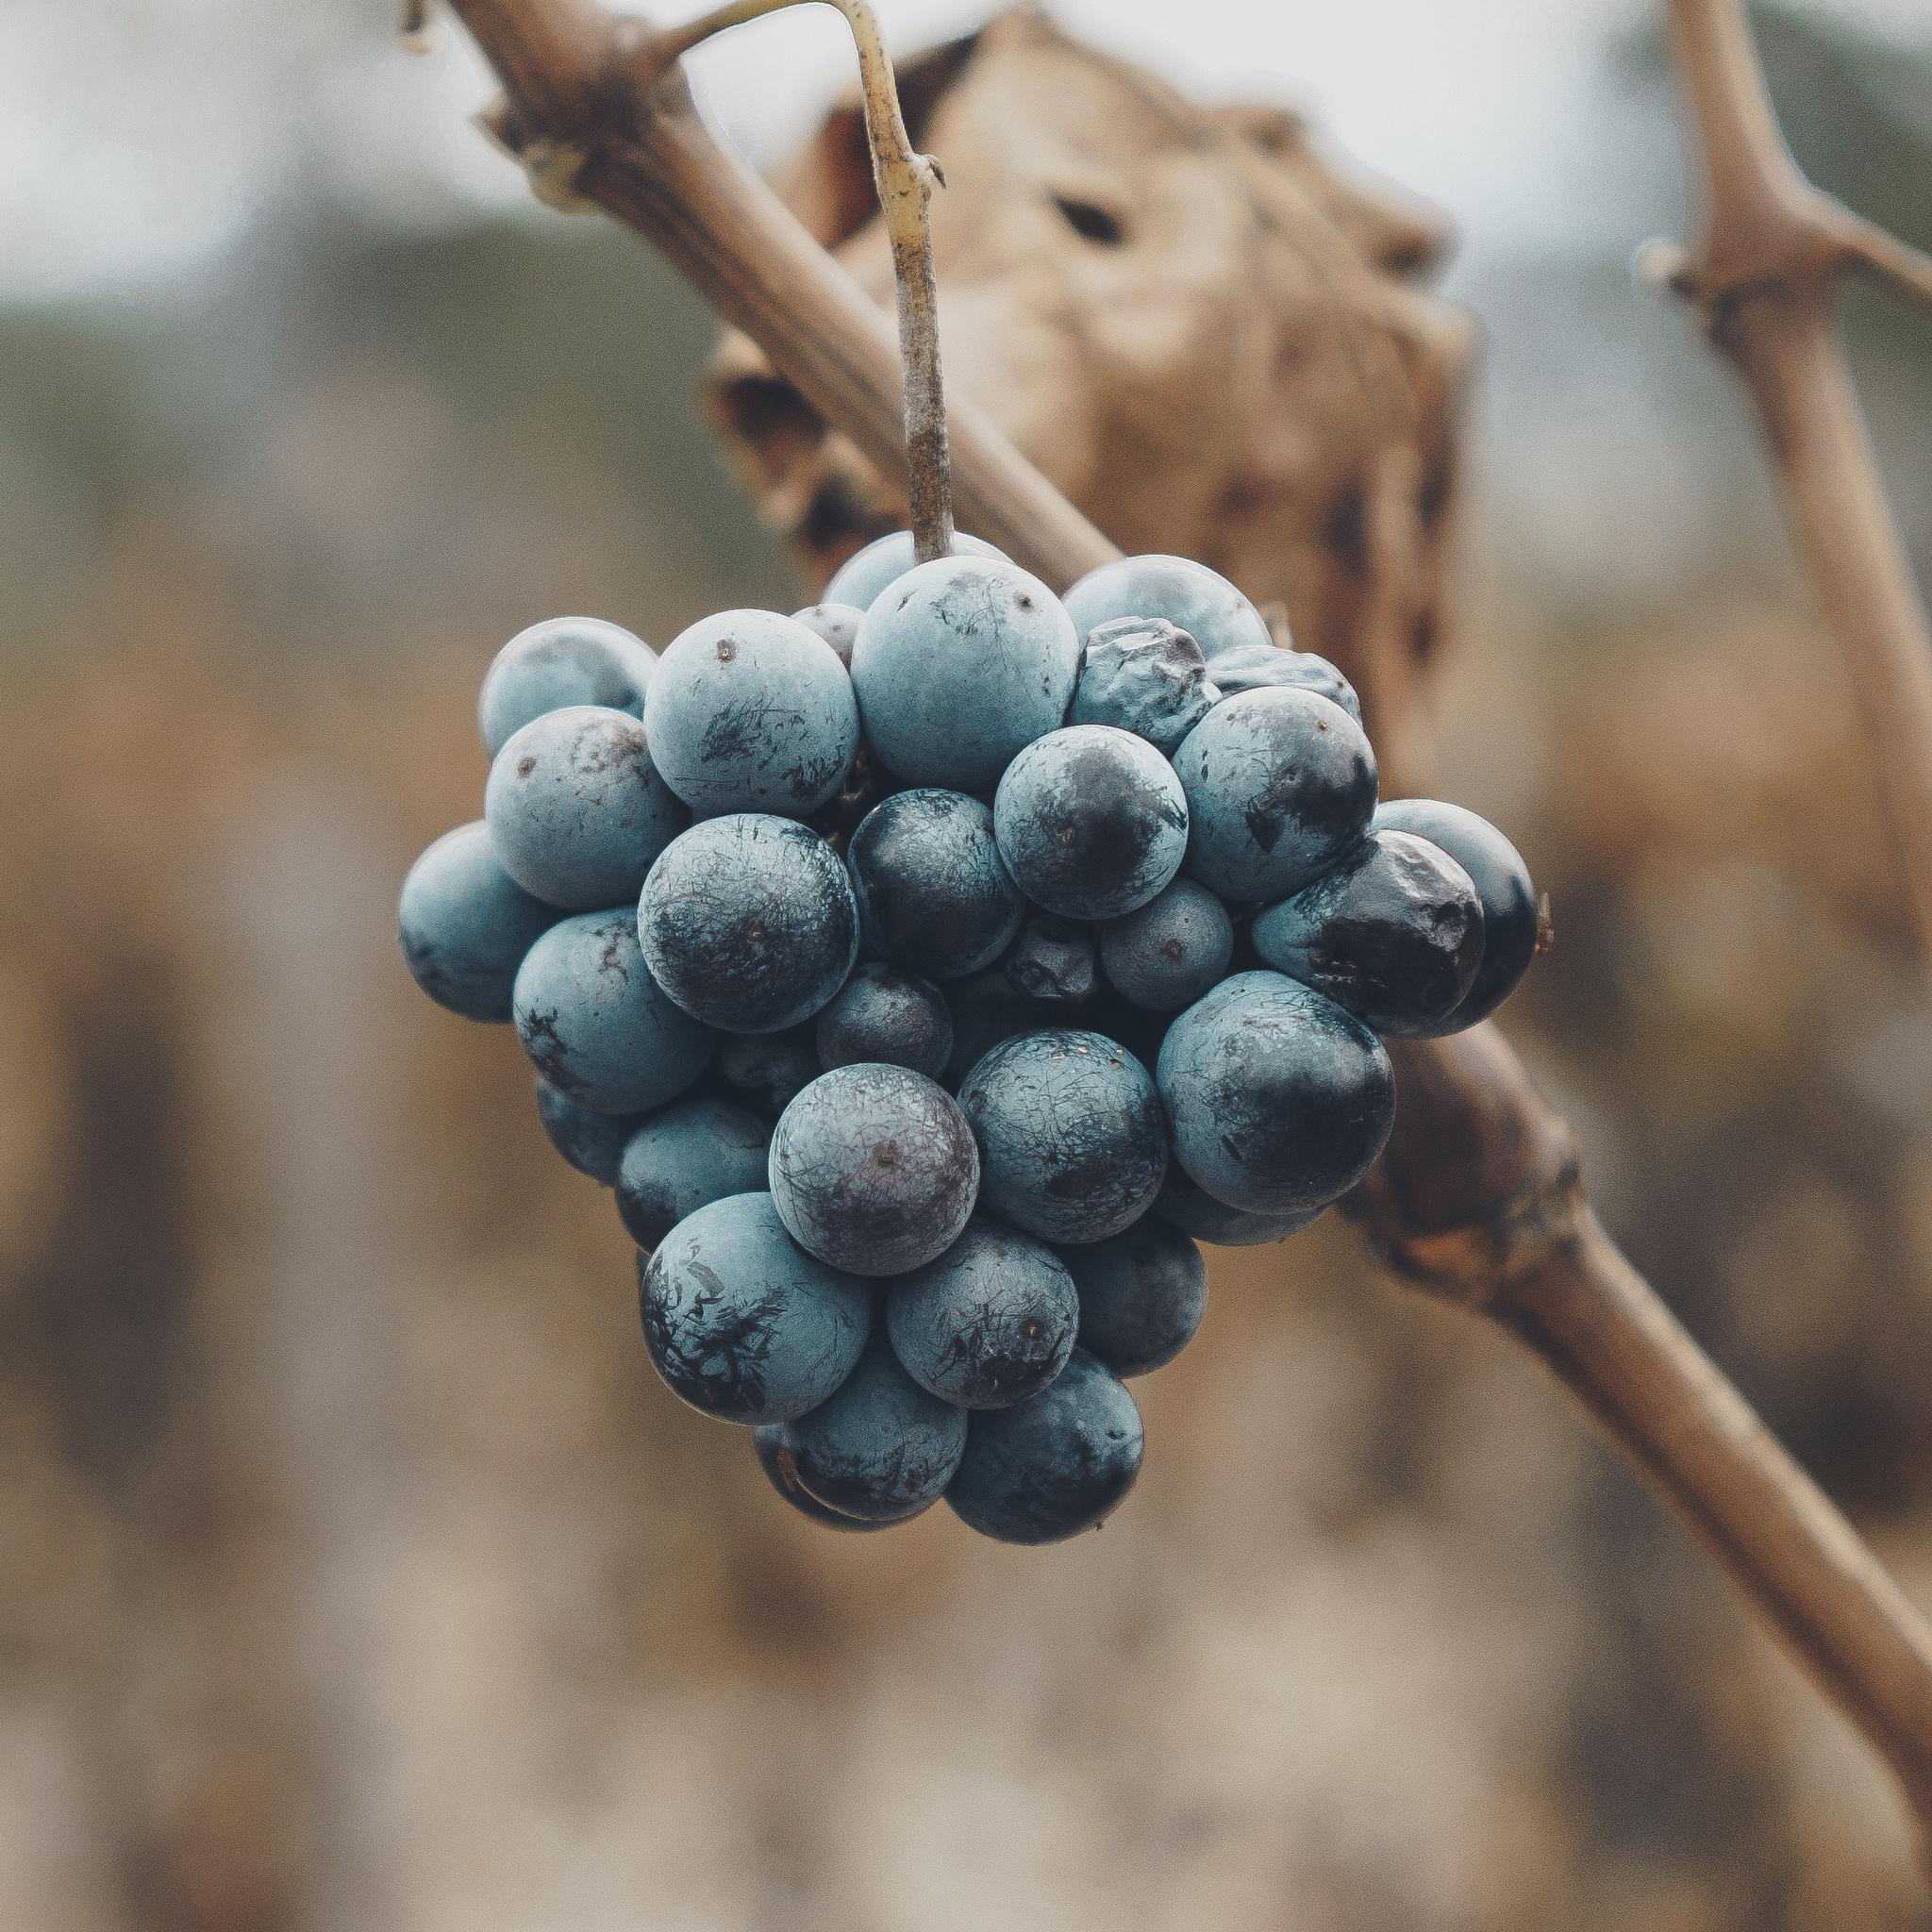 Vino by Joshua A. Hoffmann